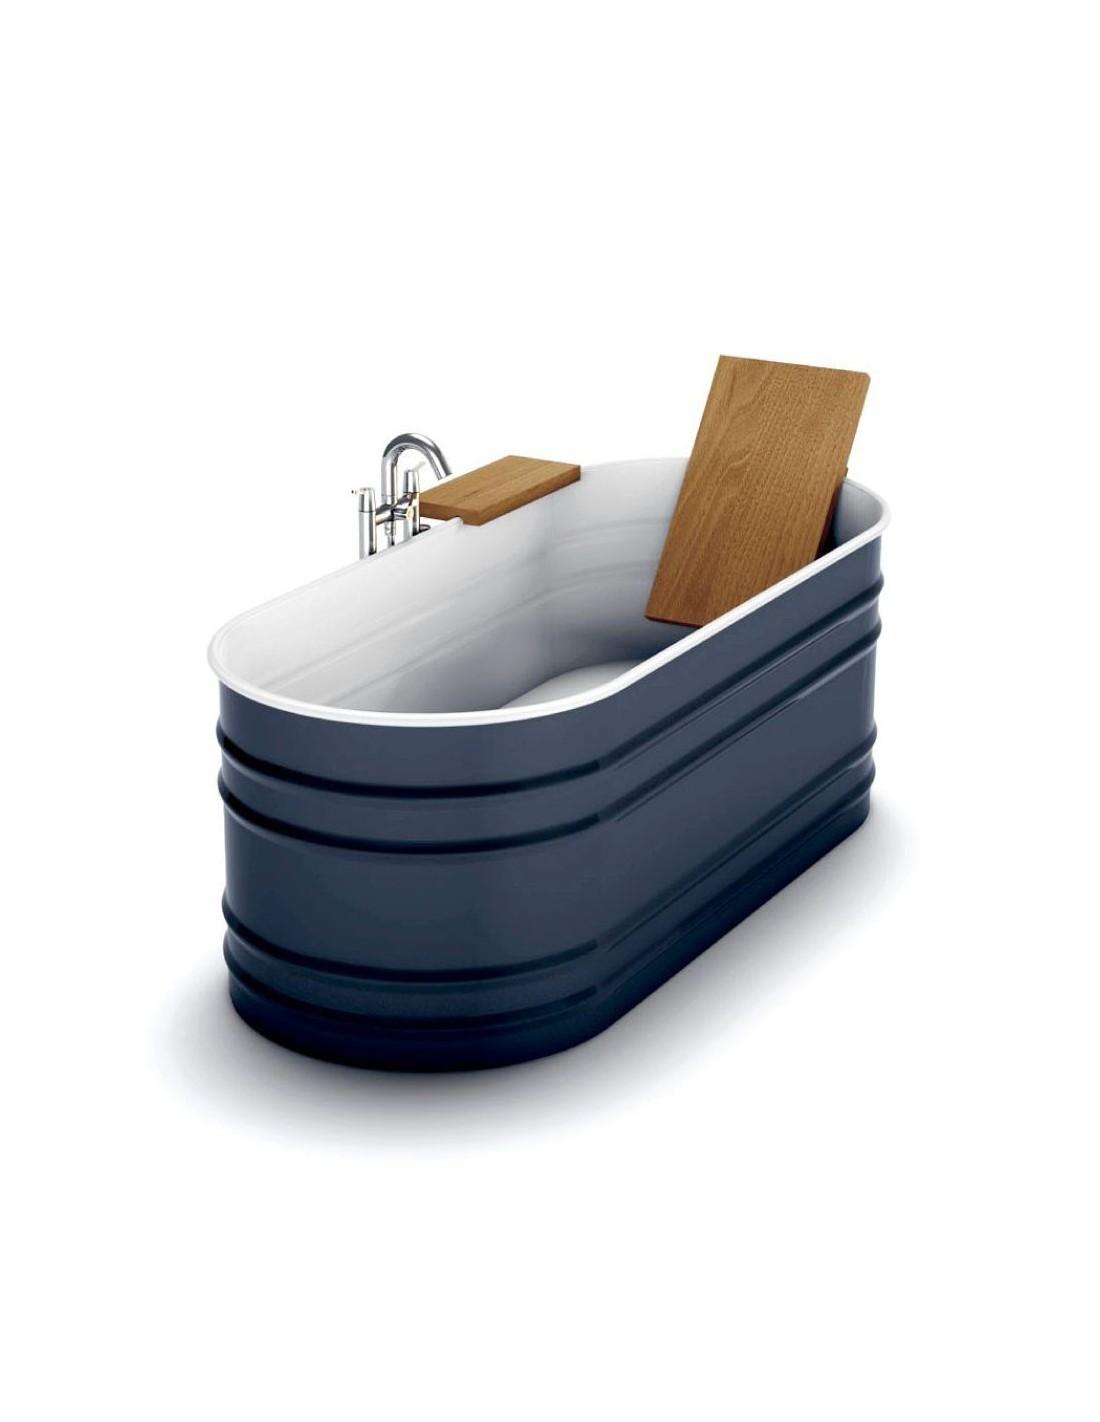 Baignoire vieques for Marque de baignoire